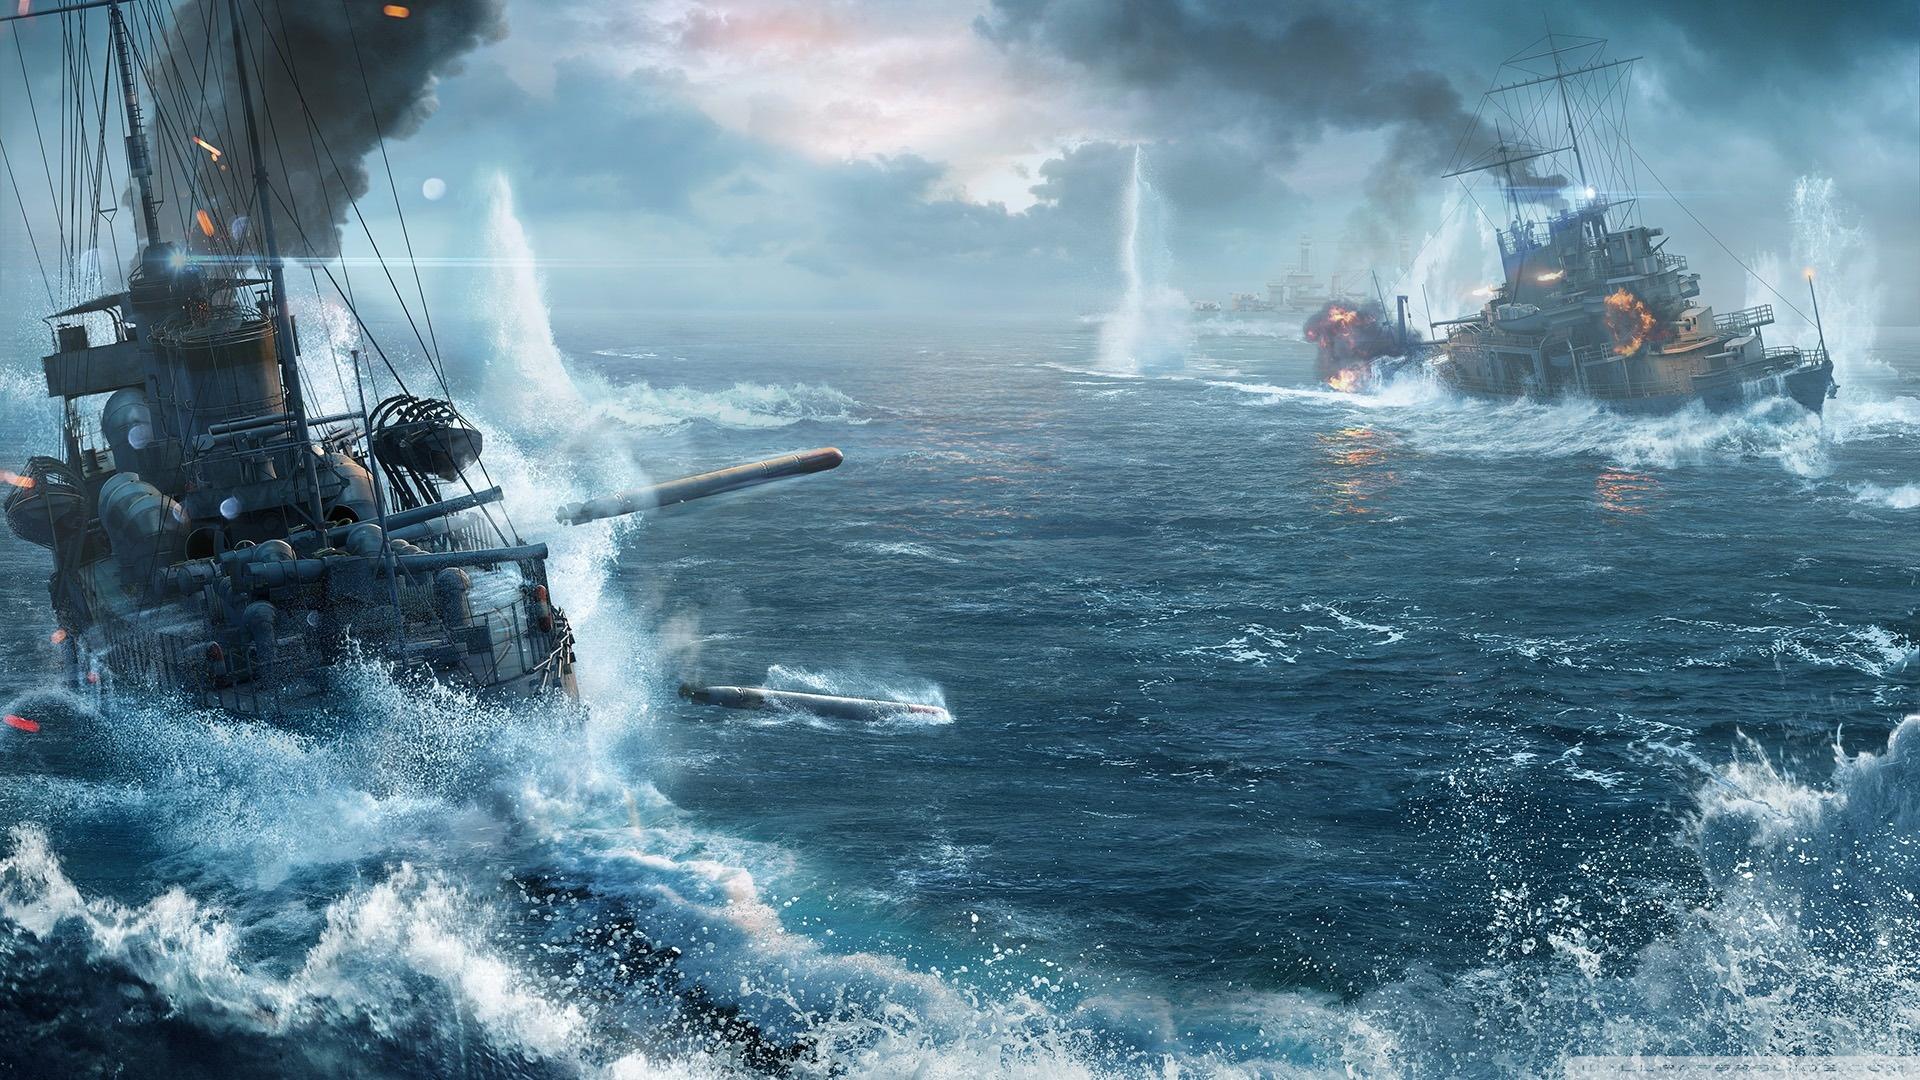 world_of_warship_ships-wallpaper-1920x1080